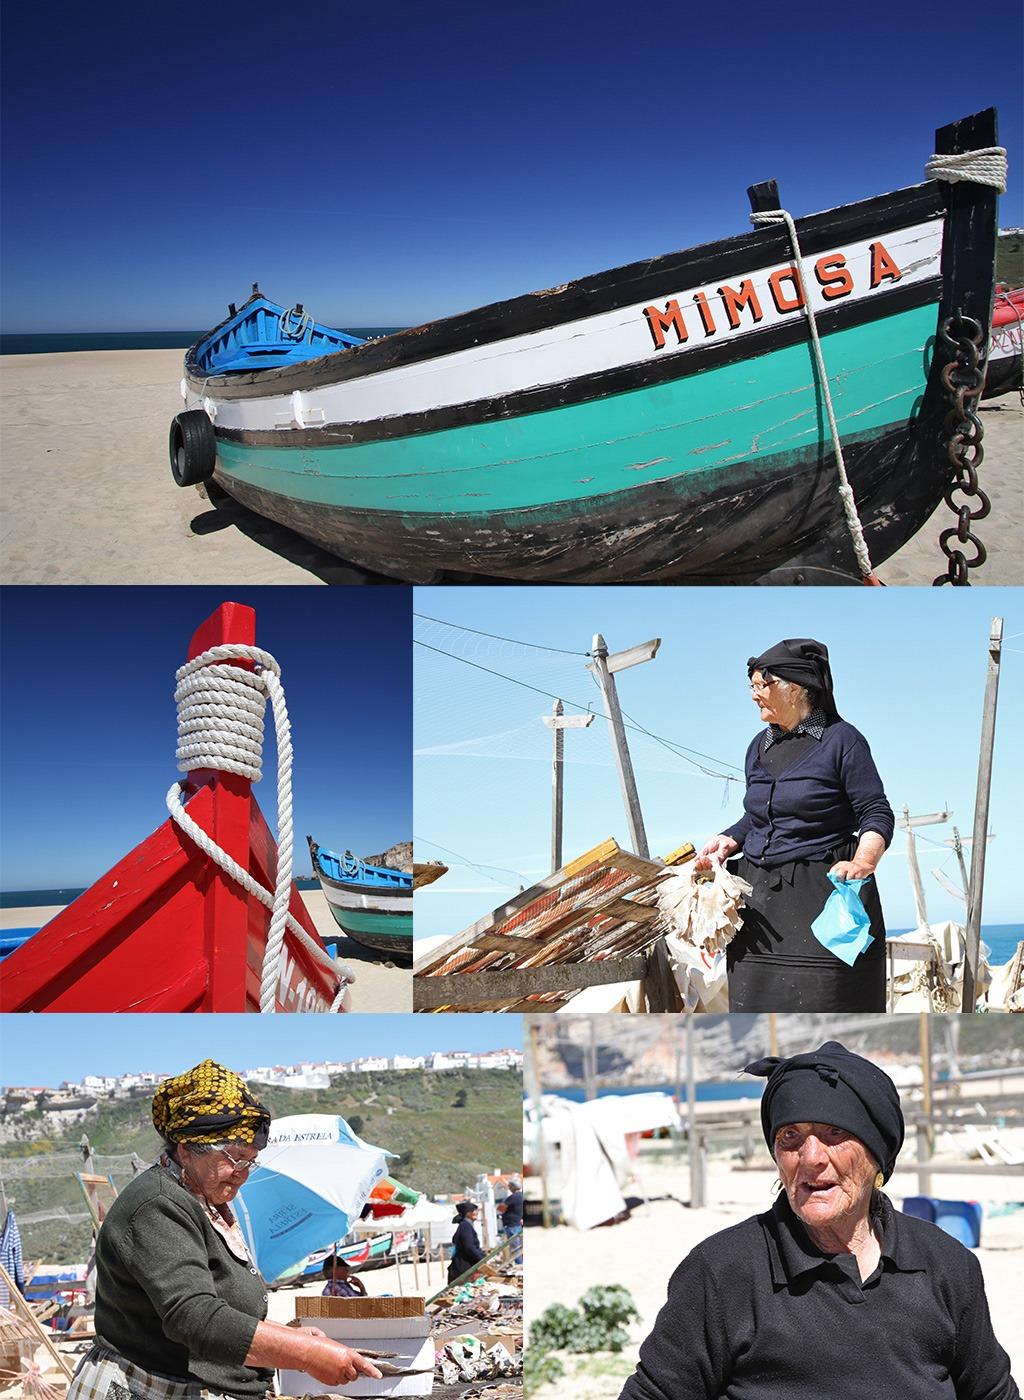 Nazaré stoere vissers